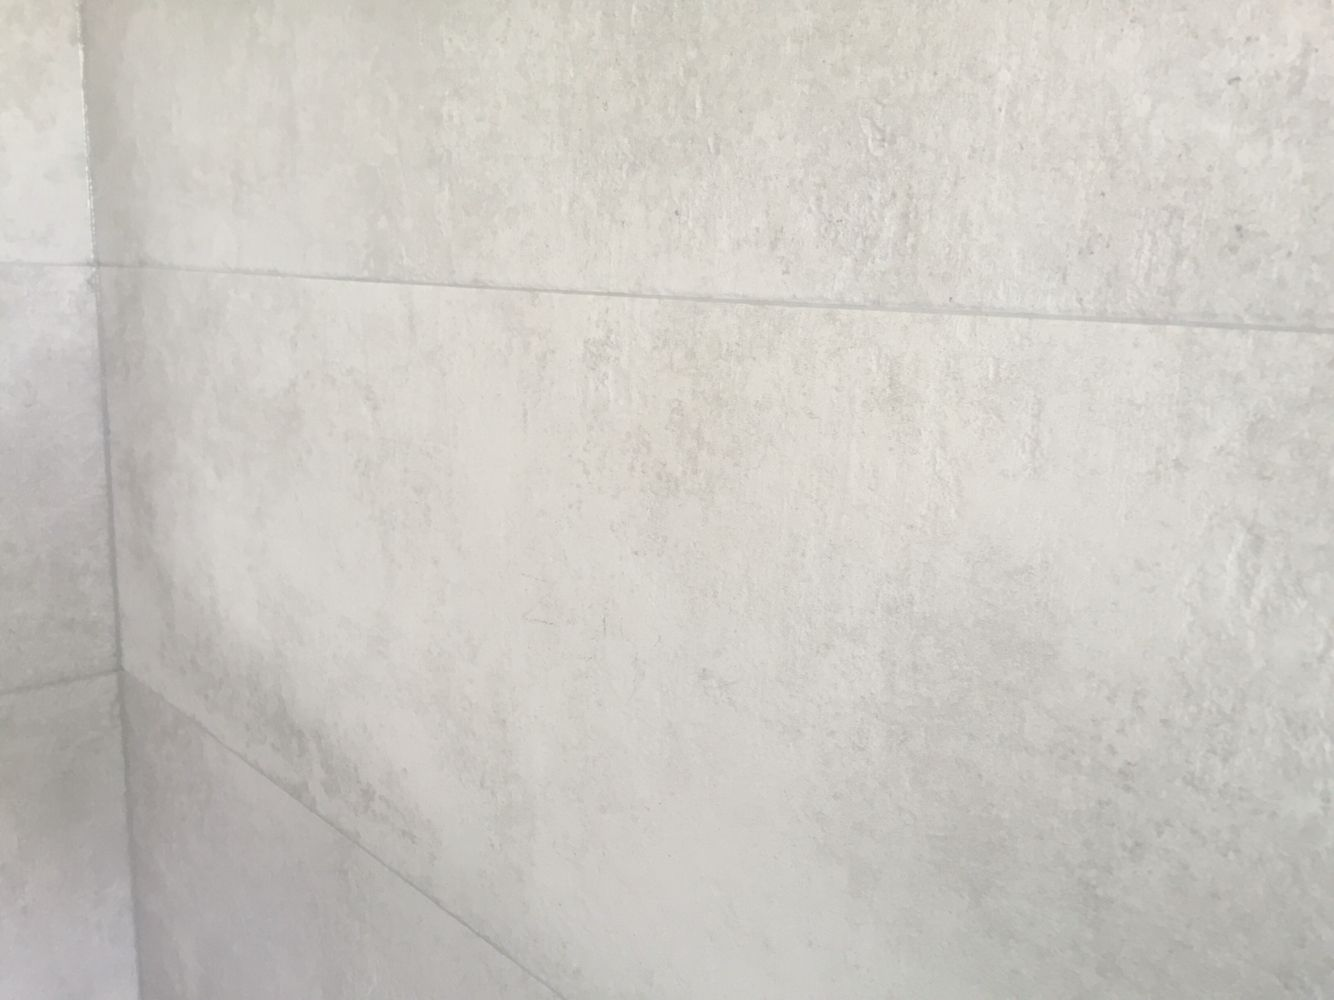 Wandtegels Badkamer Wit : Venis baltimore wandtegels badkamer wit mahon baltimore